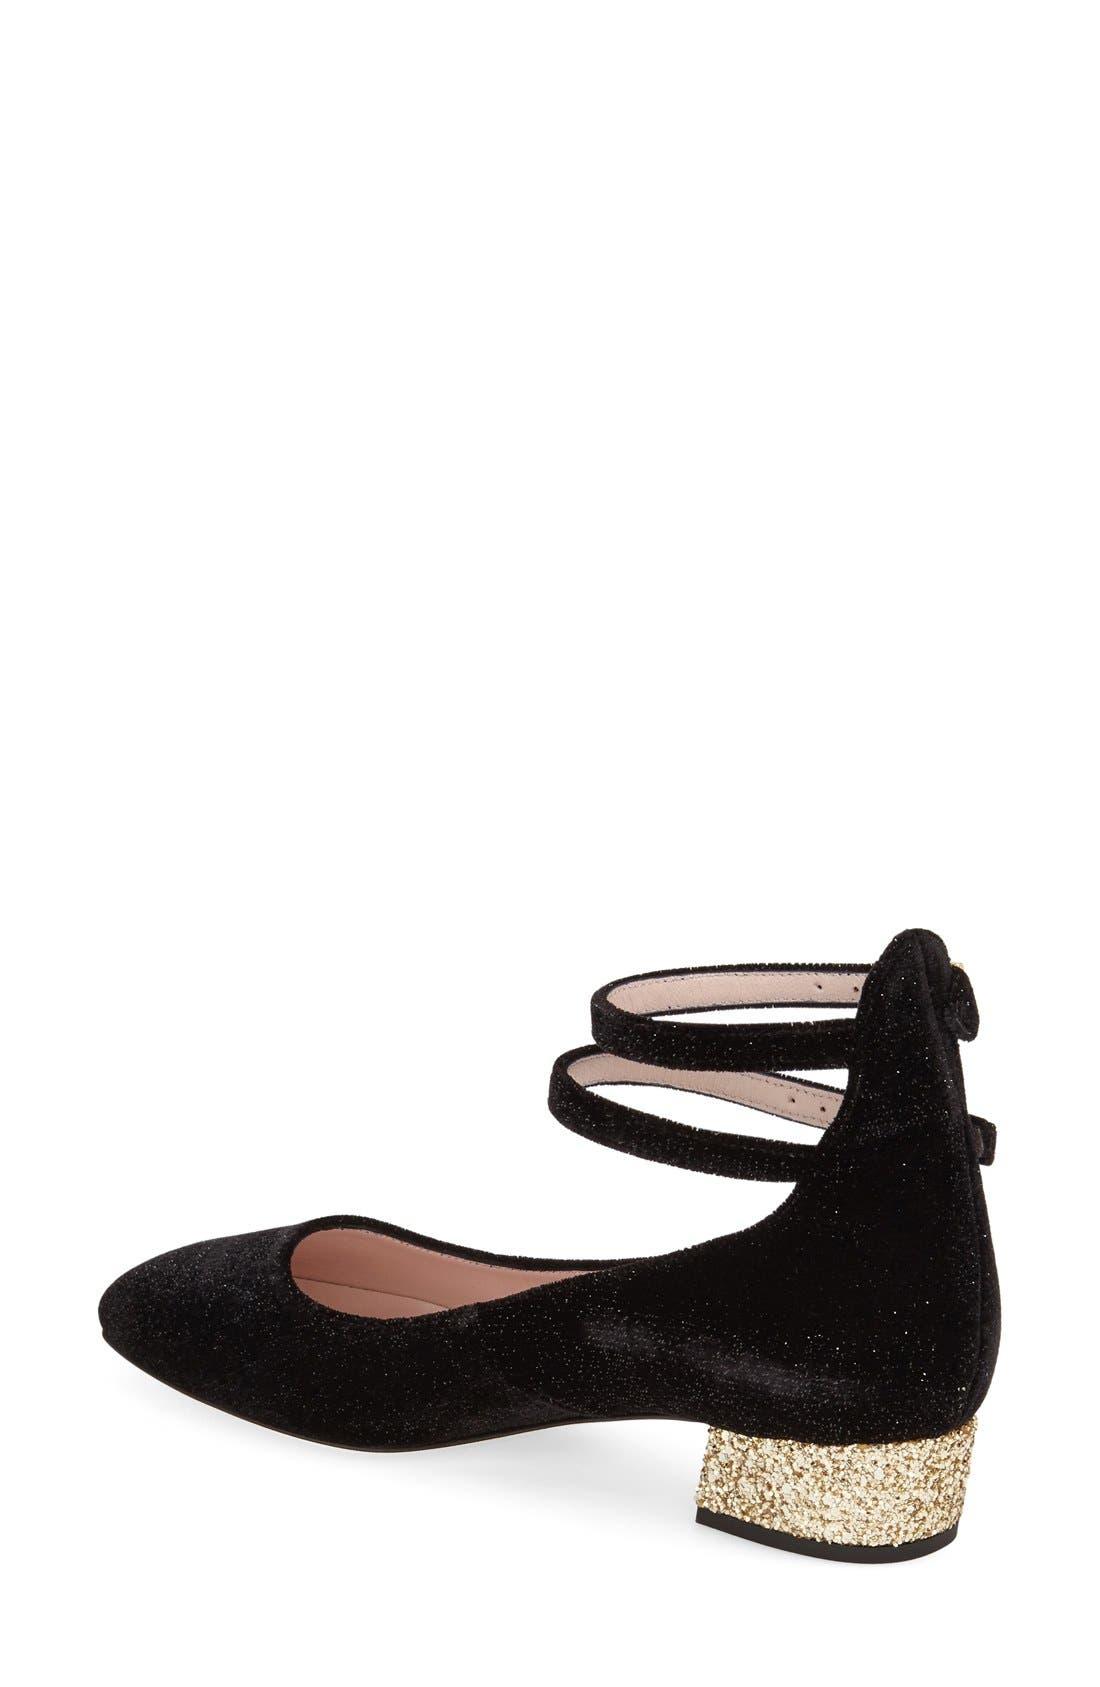 Alternate Image 2  - kate spade new york 'marcellina' ankle strap pump (Women)